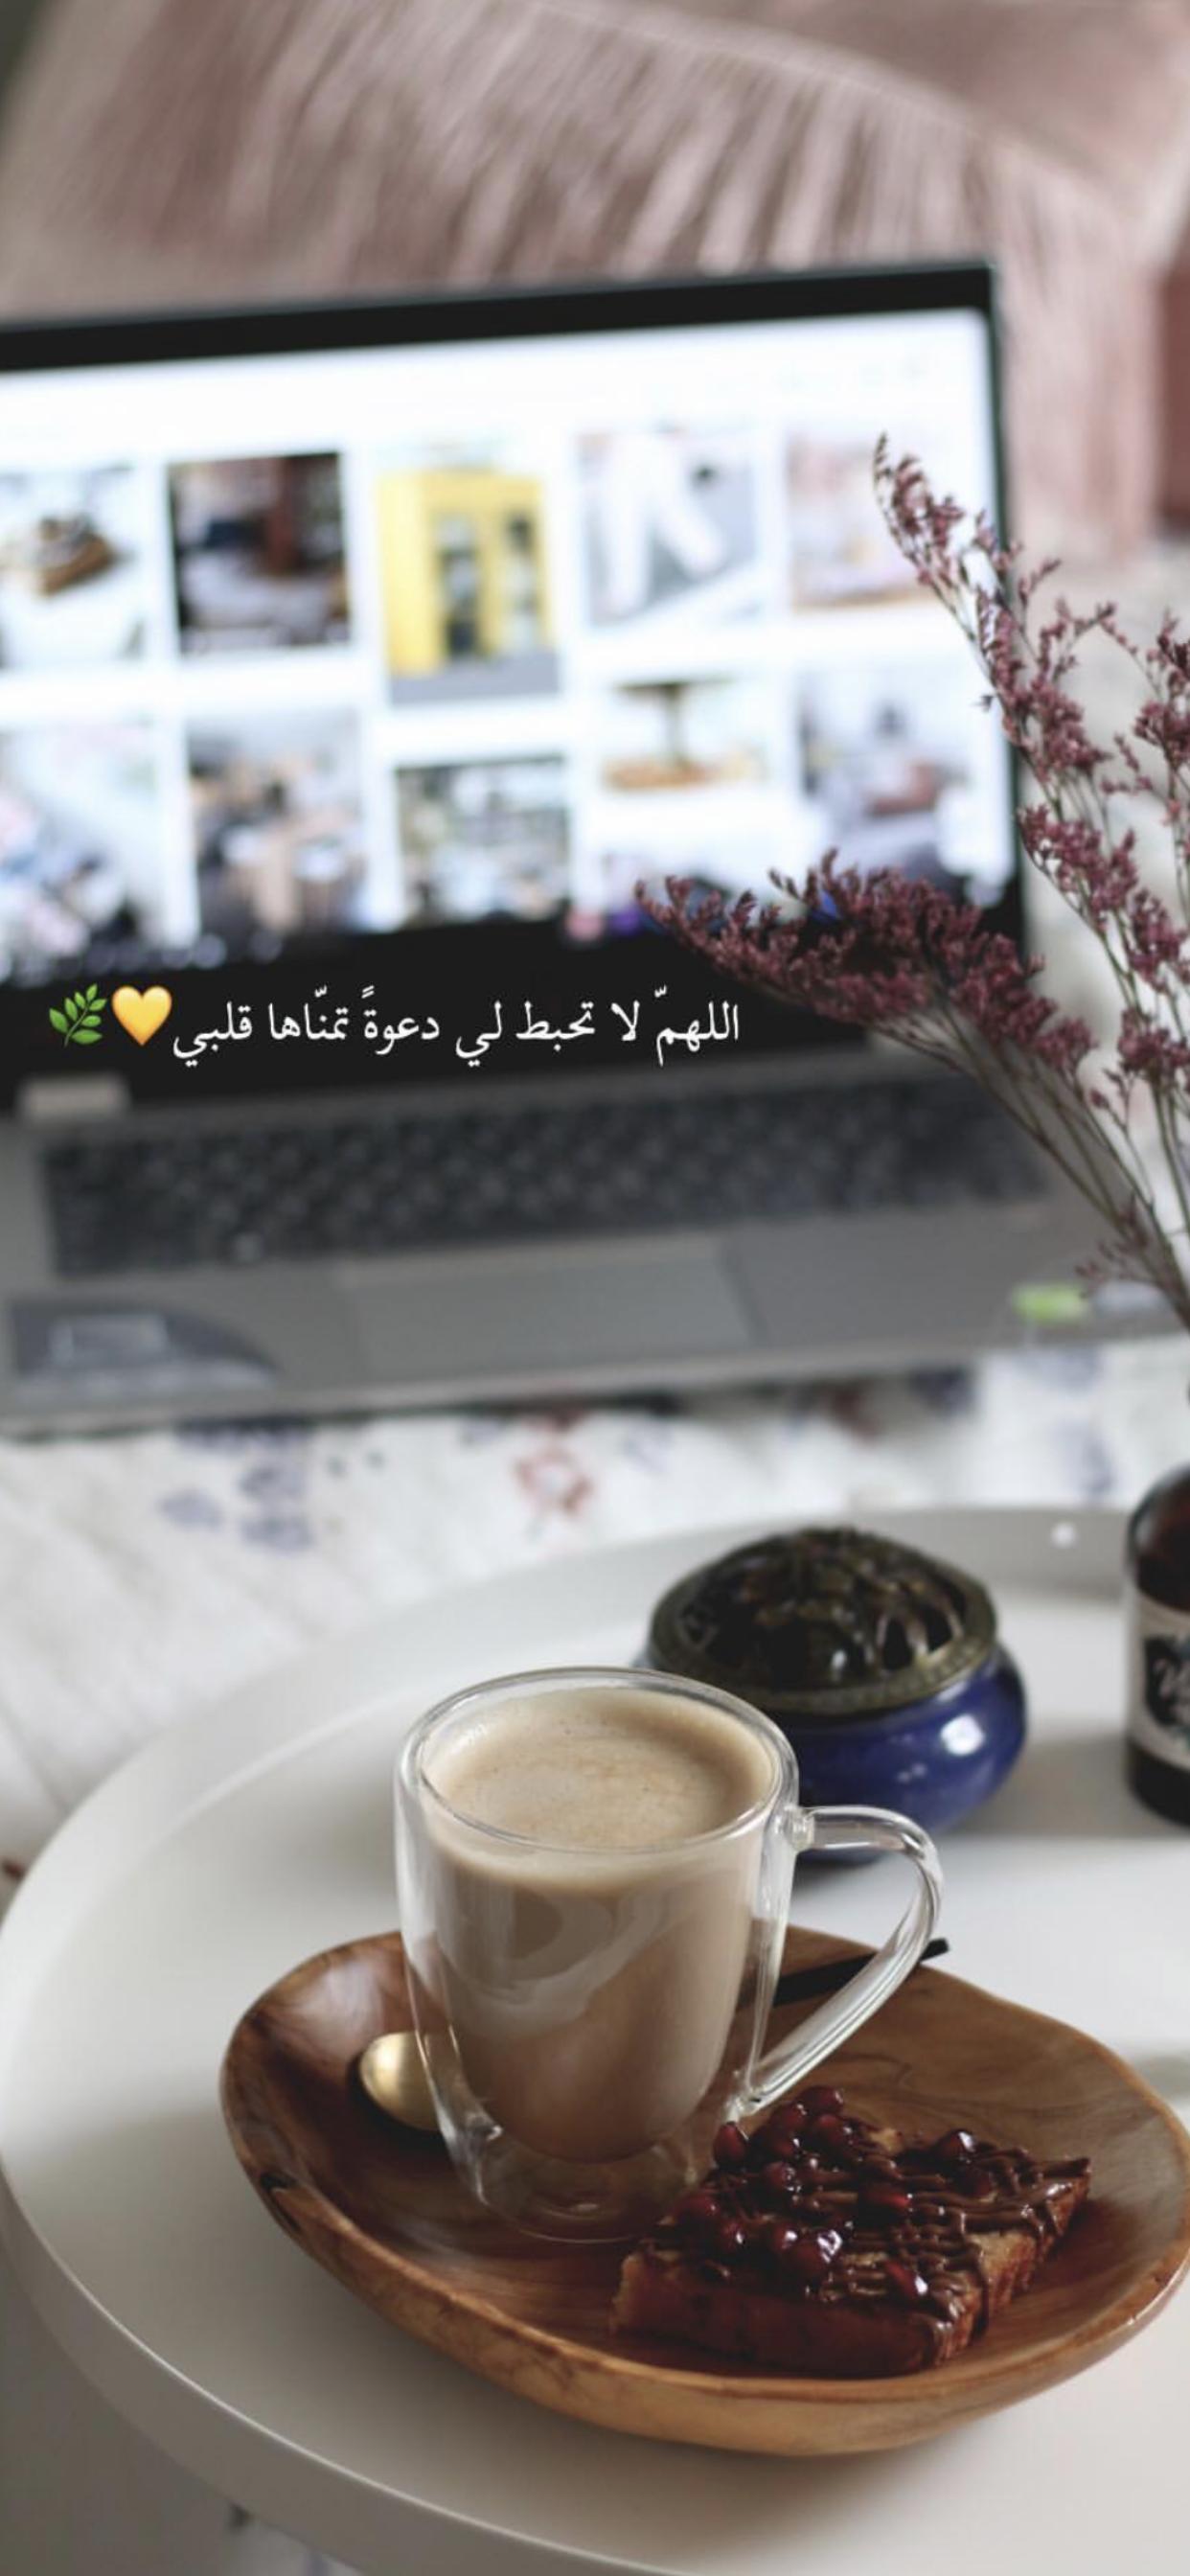 Pin By Yusra Fuad On مختارات موضي البليهد Arabic Tattoo Quotes Photo Quotes Good Morning Coffee